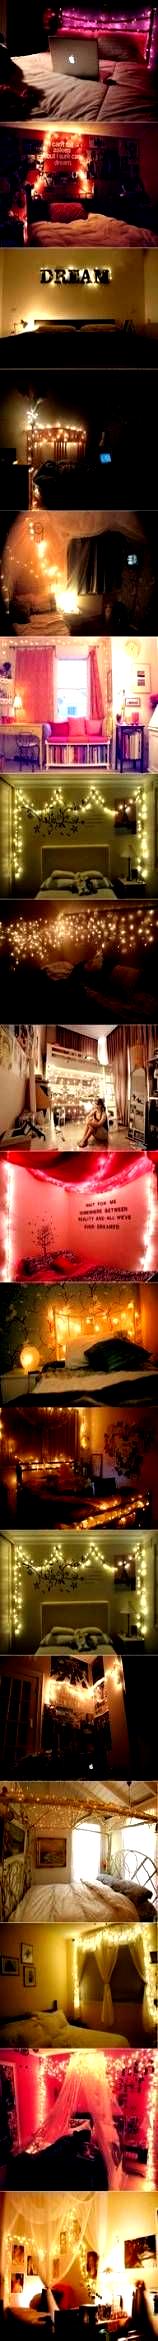 Super diy crafts for teen girls bedroom cheap stri #Bedroom #Cheap #cheap_teen_c...#bedroom #cheap #cheapteenc #crafts #diy #girls #stri #super #teen #christmasroomdecorforteens